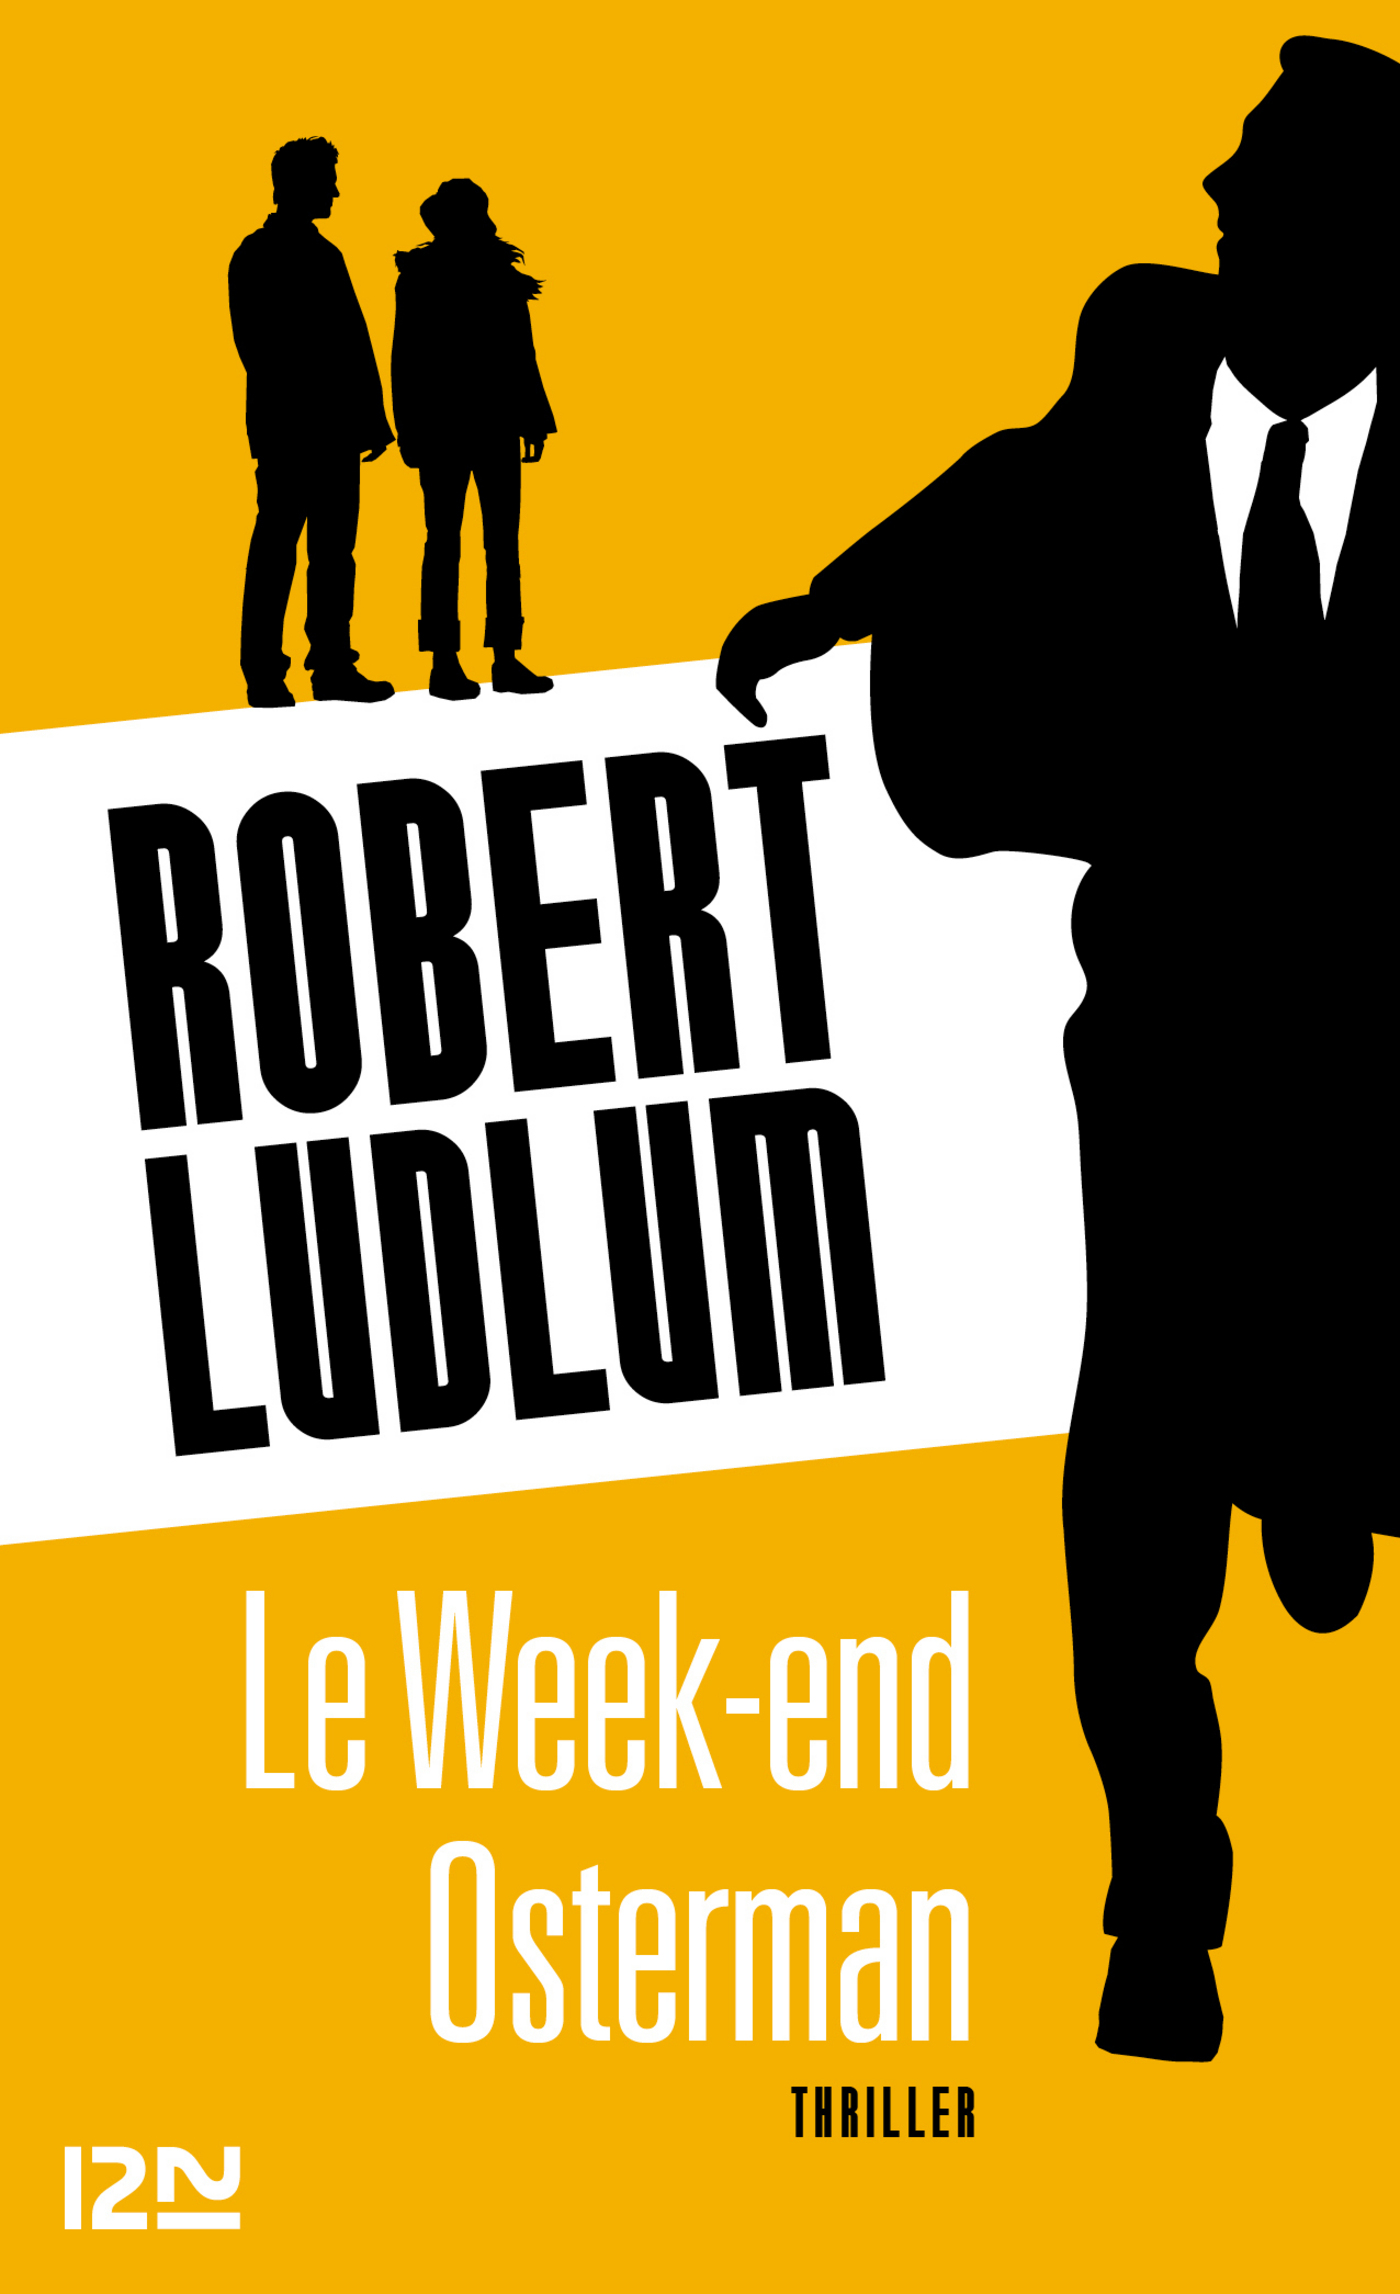 Le Week-end Osterman